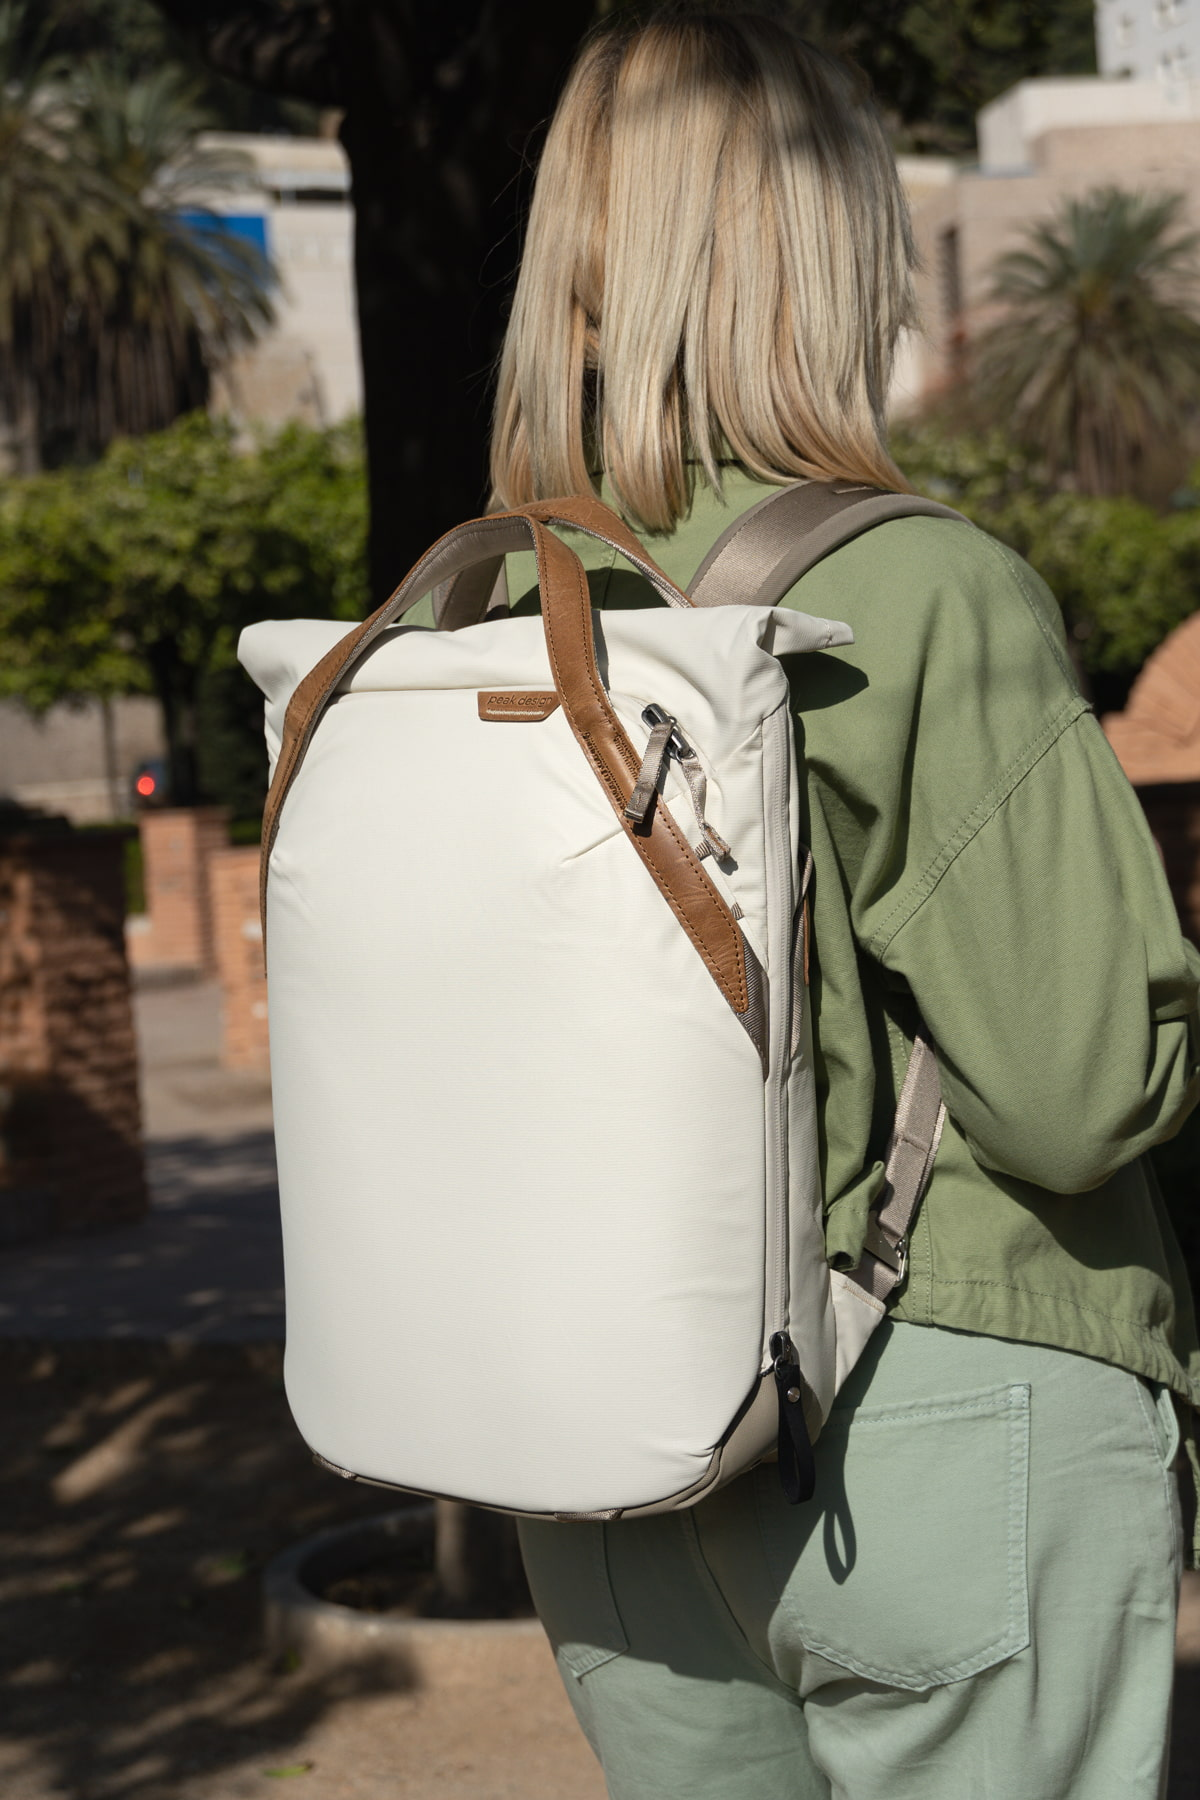 Best Camera Backpack for Women